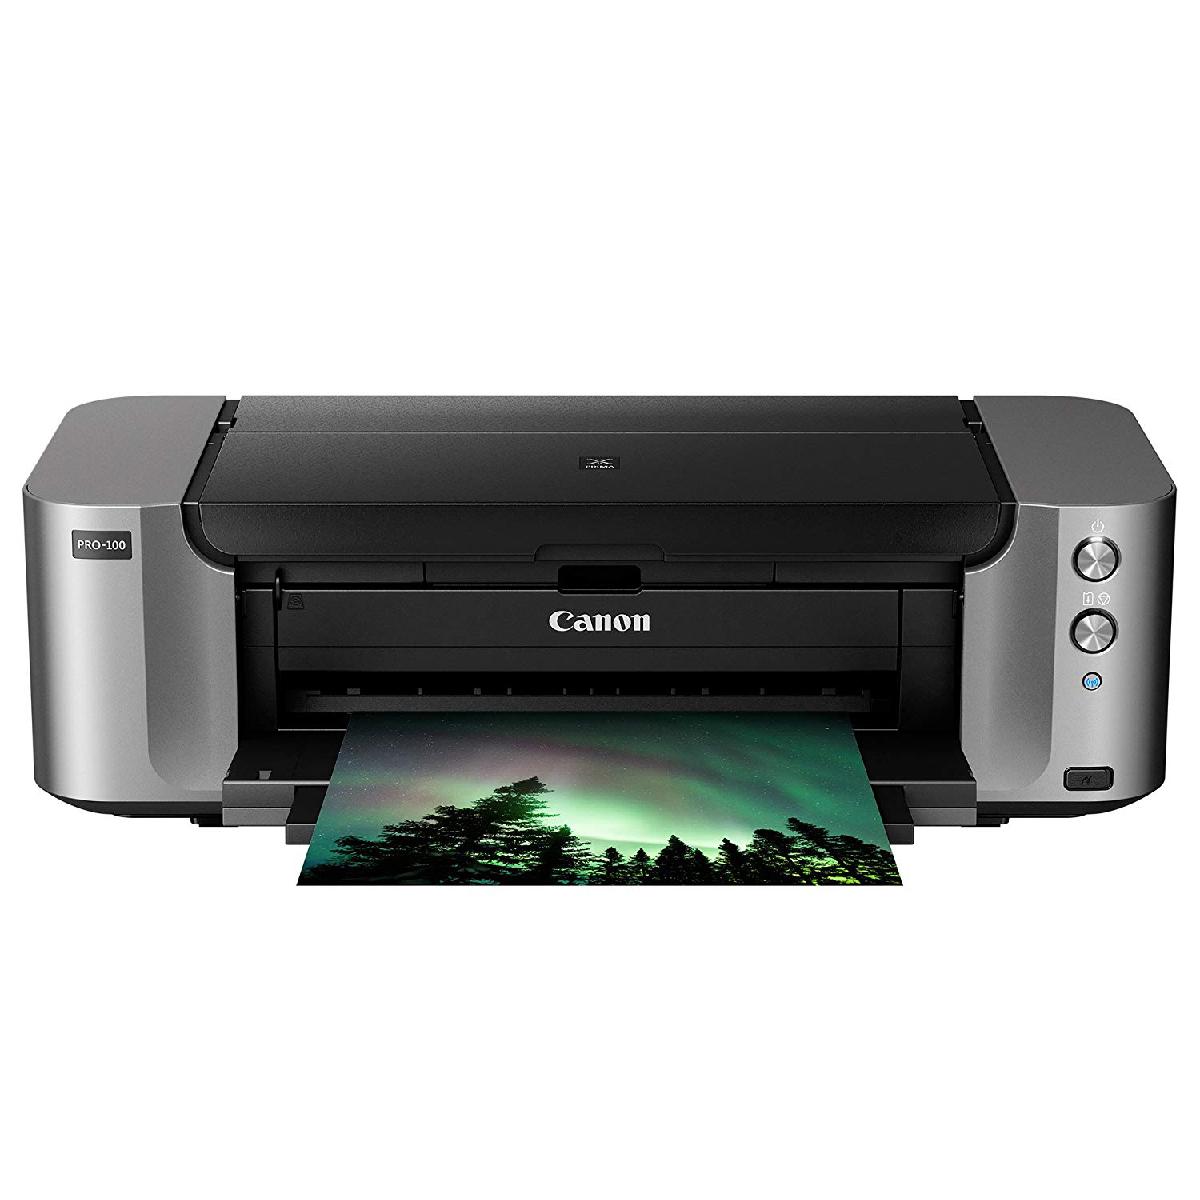 Canon Pixma Pro 100.jpg